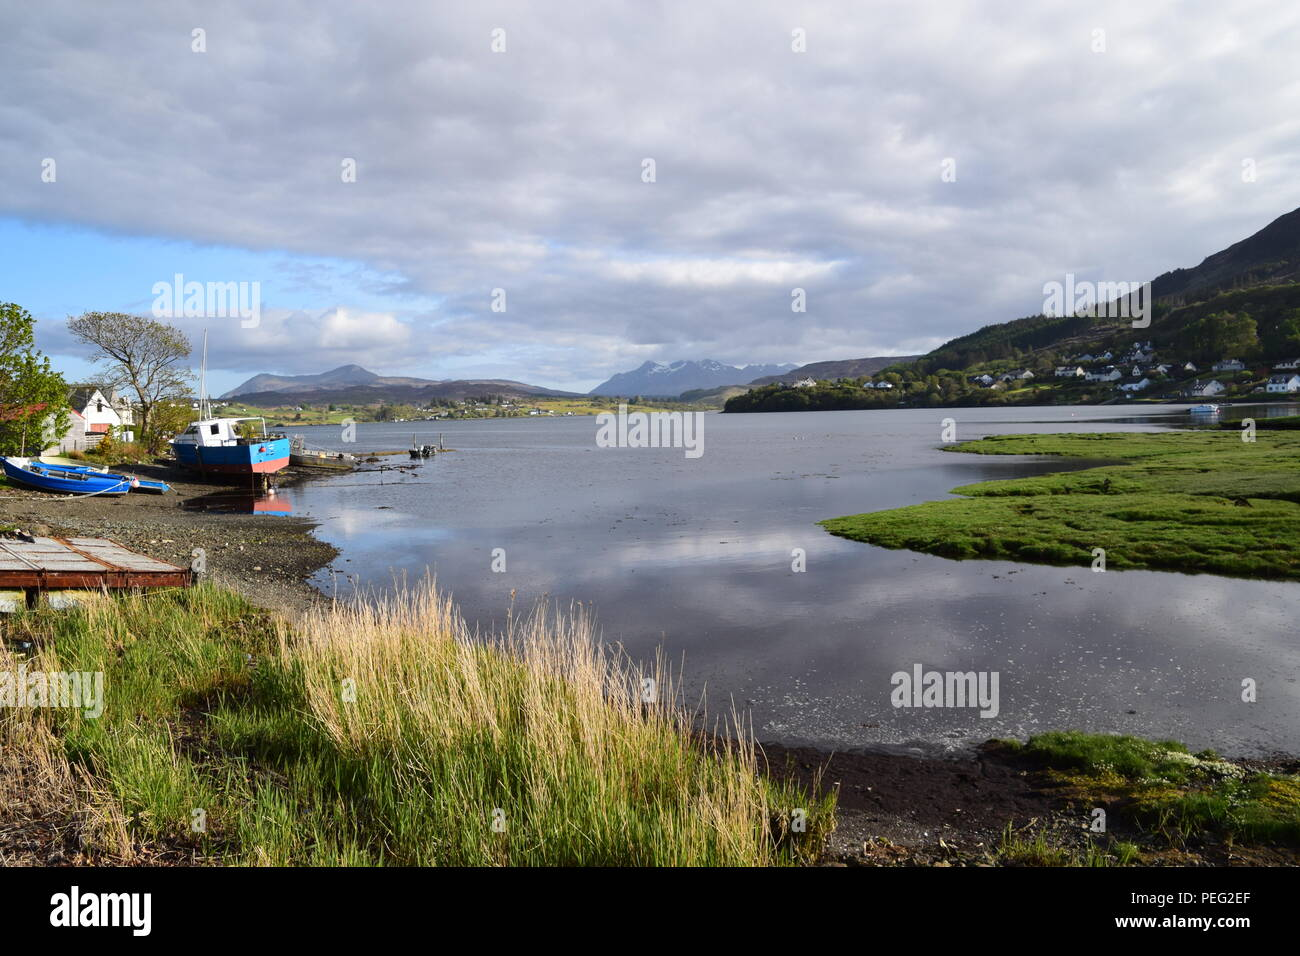 Portree, Skye, Scotland - Stock Image